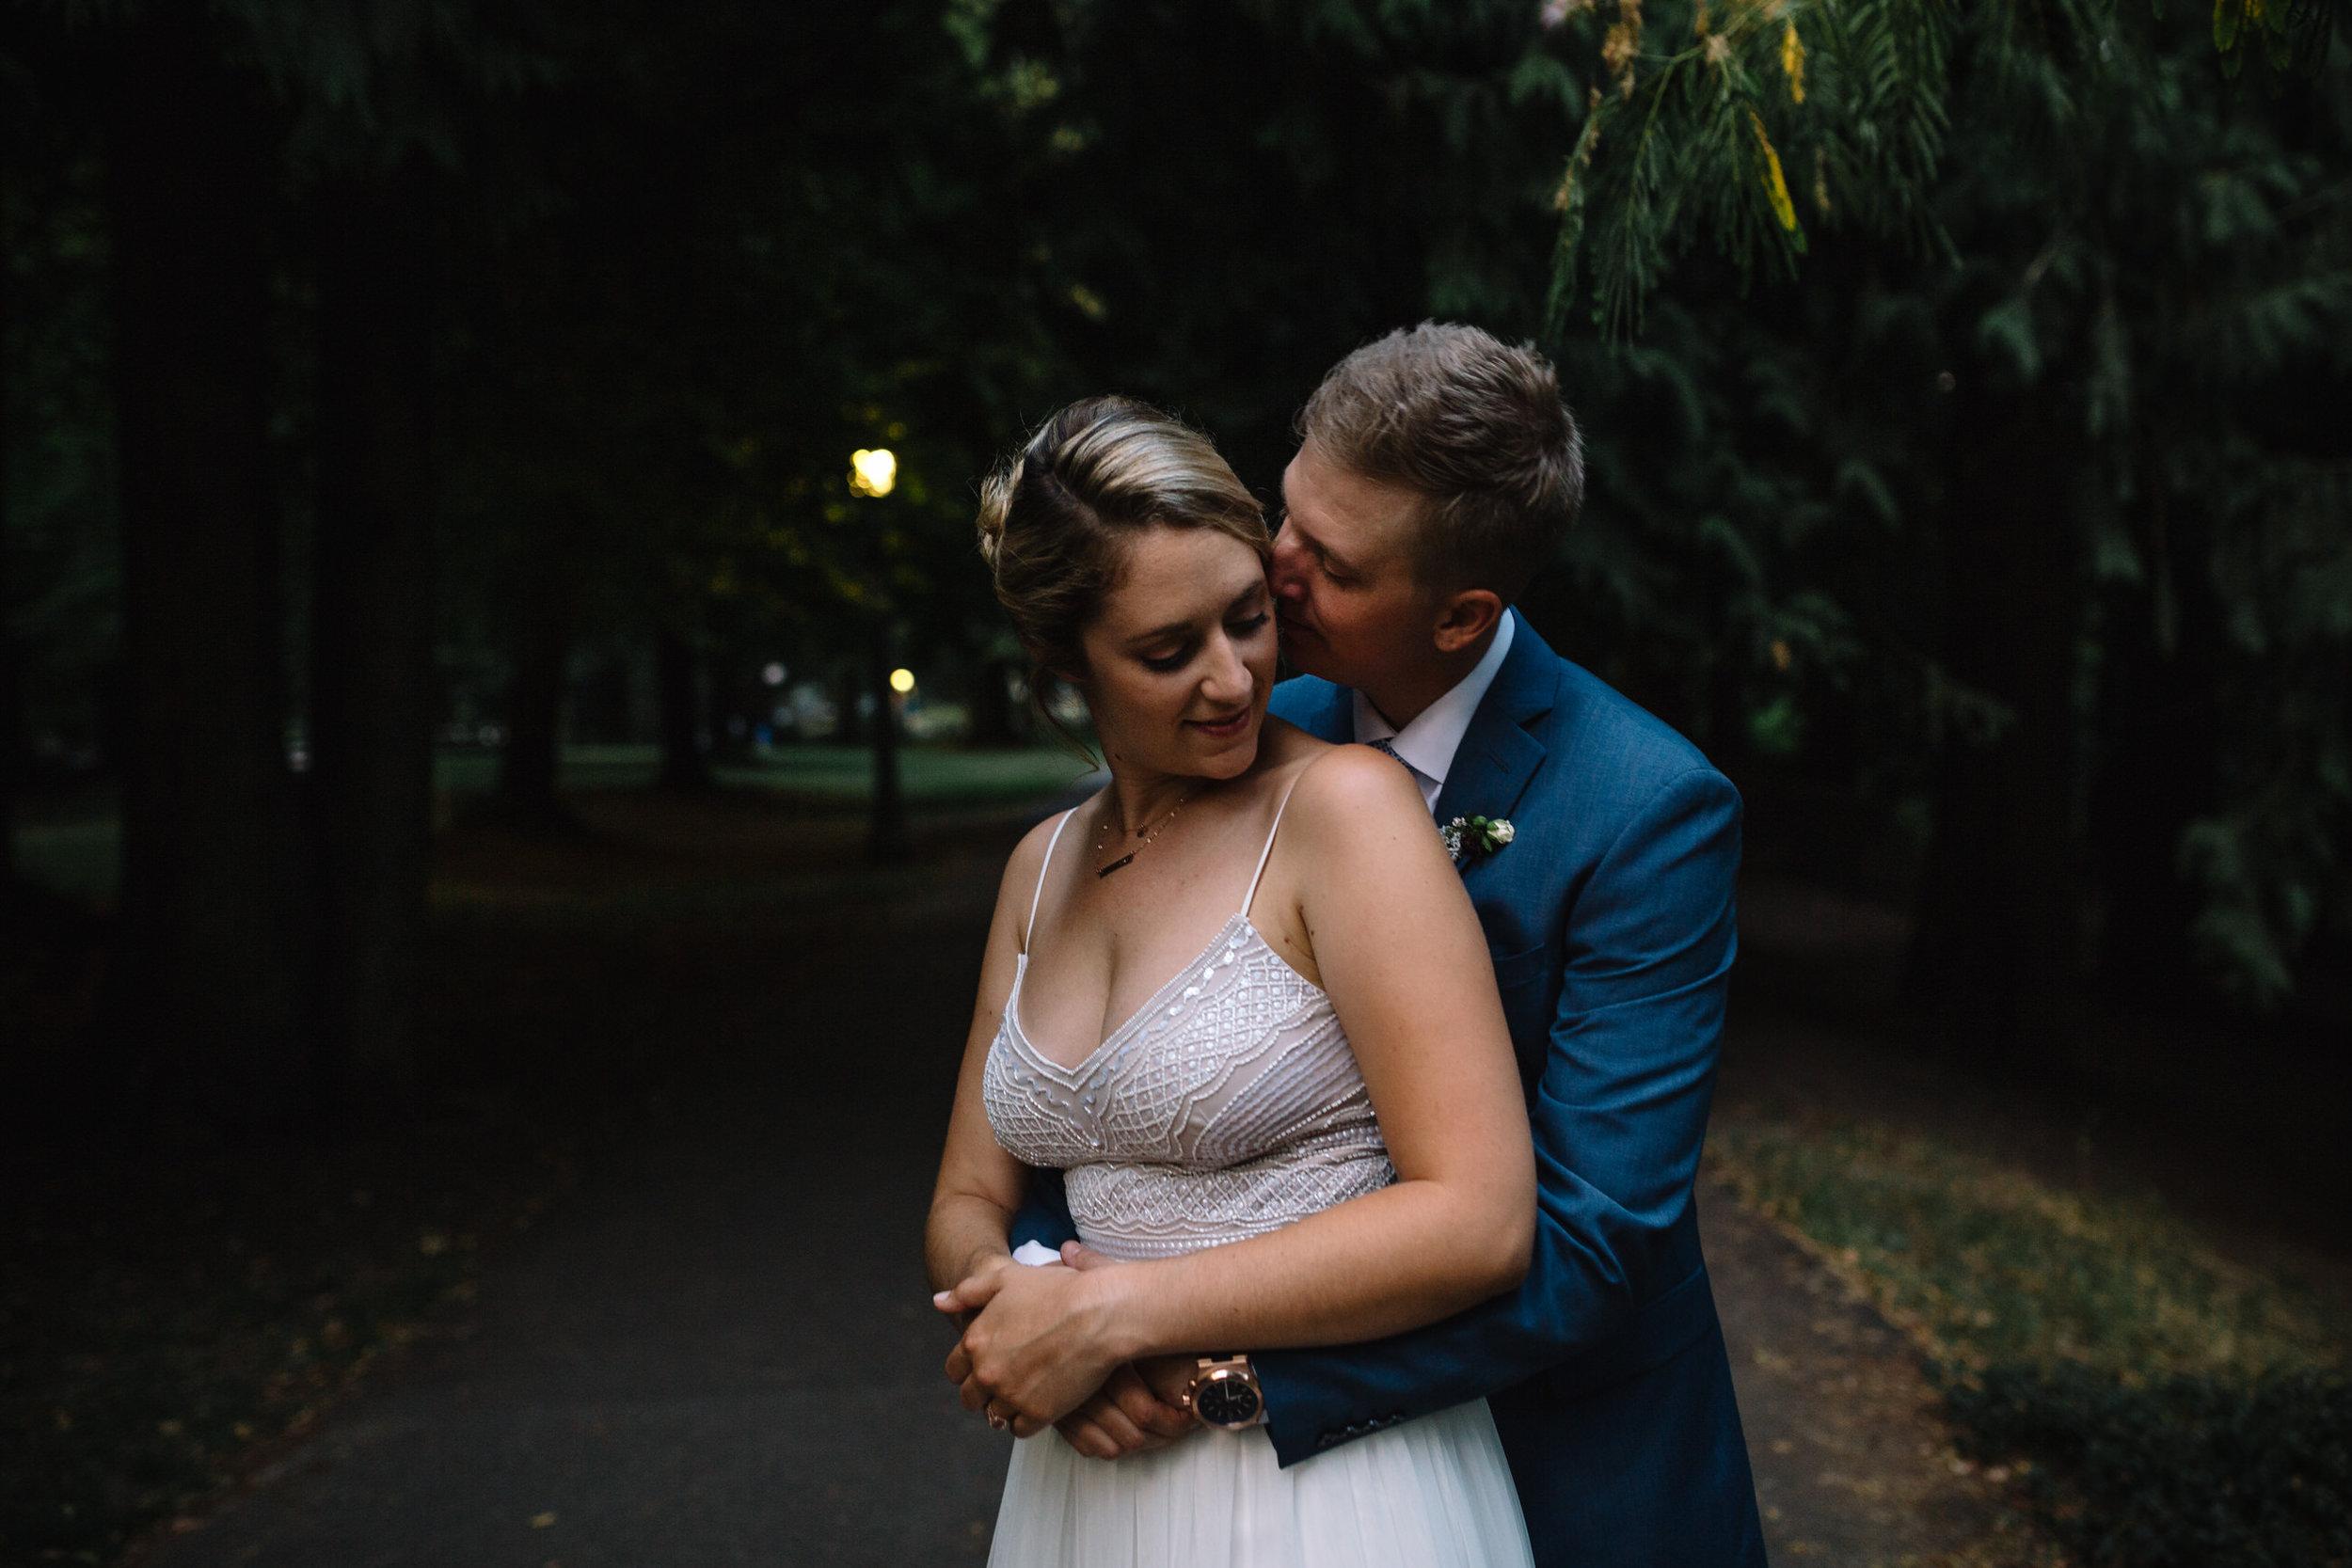 Laurelhurst Park club wedding photographer Portand pdx Oregon141.JPG